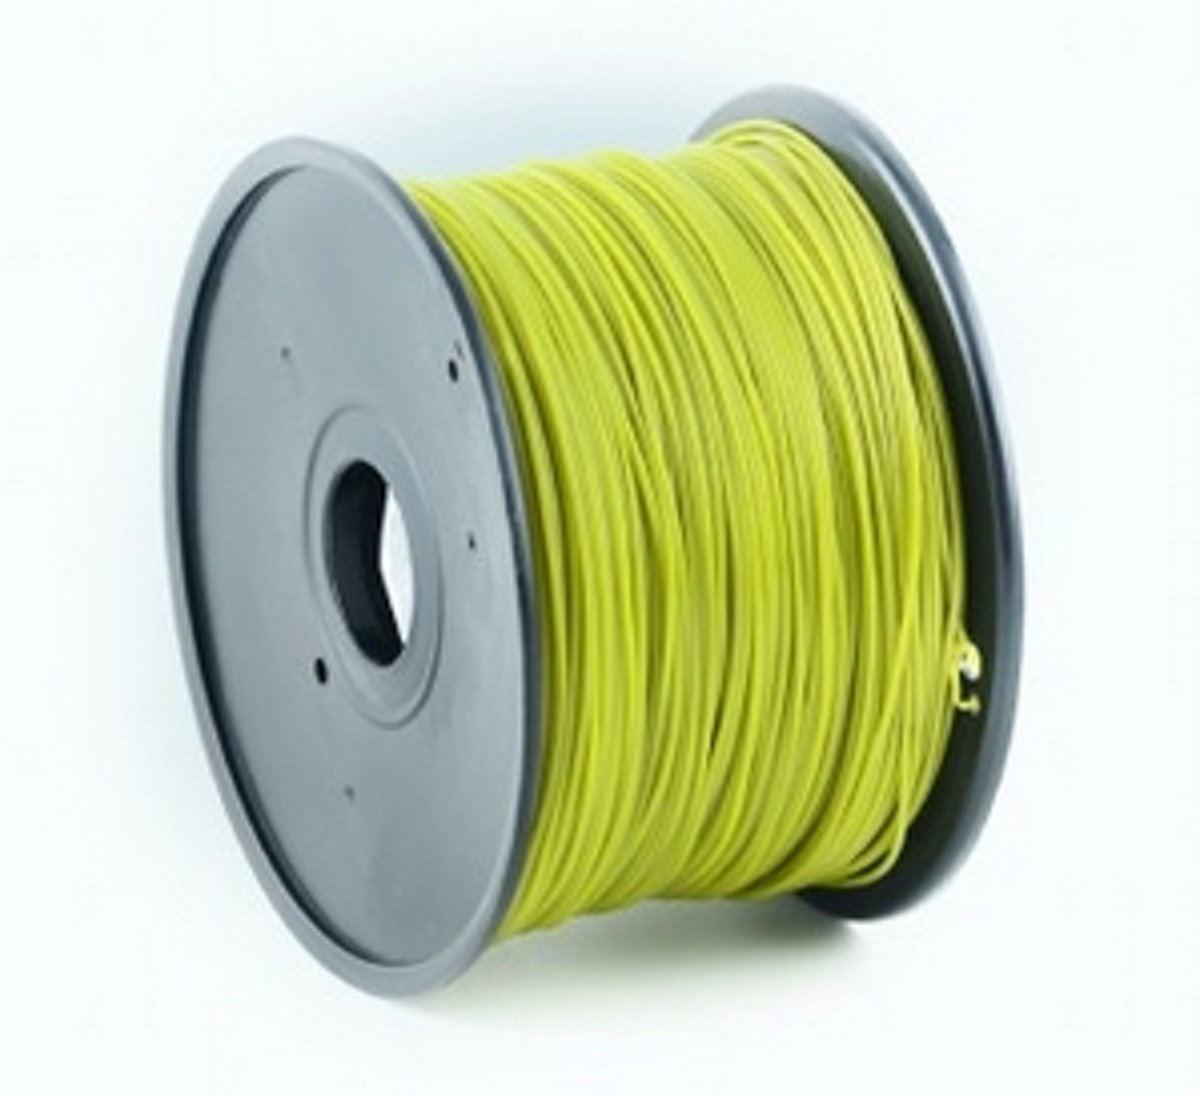 Gembird3 3DP-PLA3-01-OL - Filament PLA, 3 mm, olijfgroen